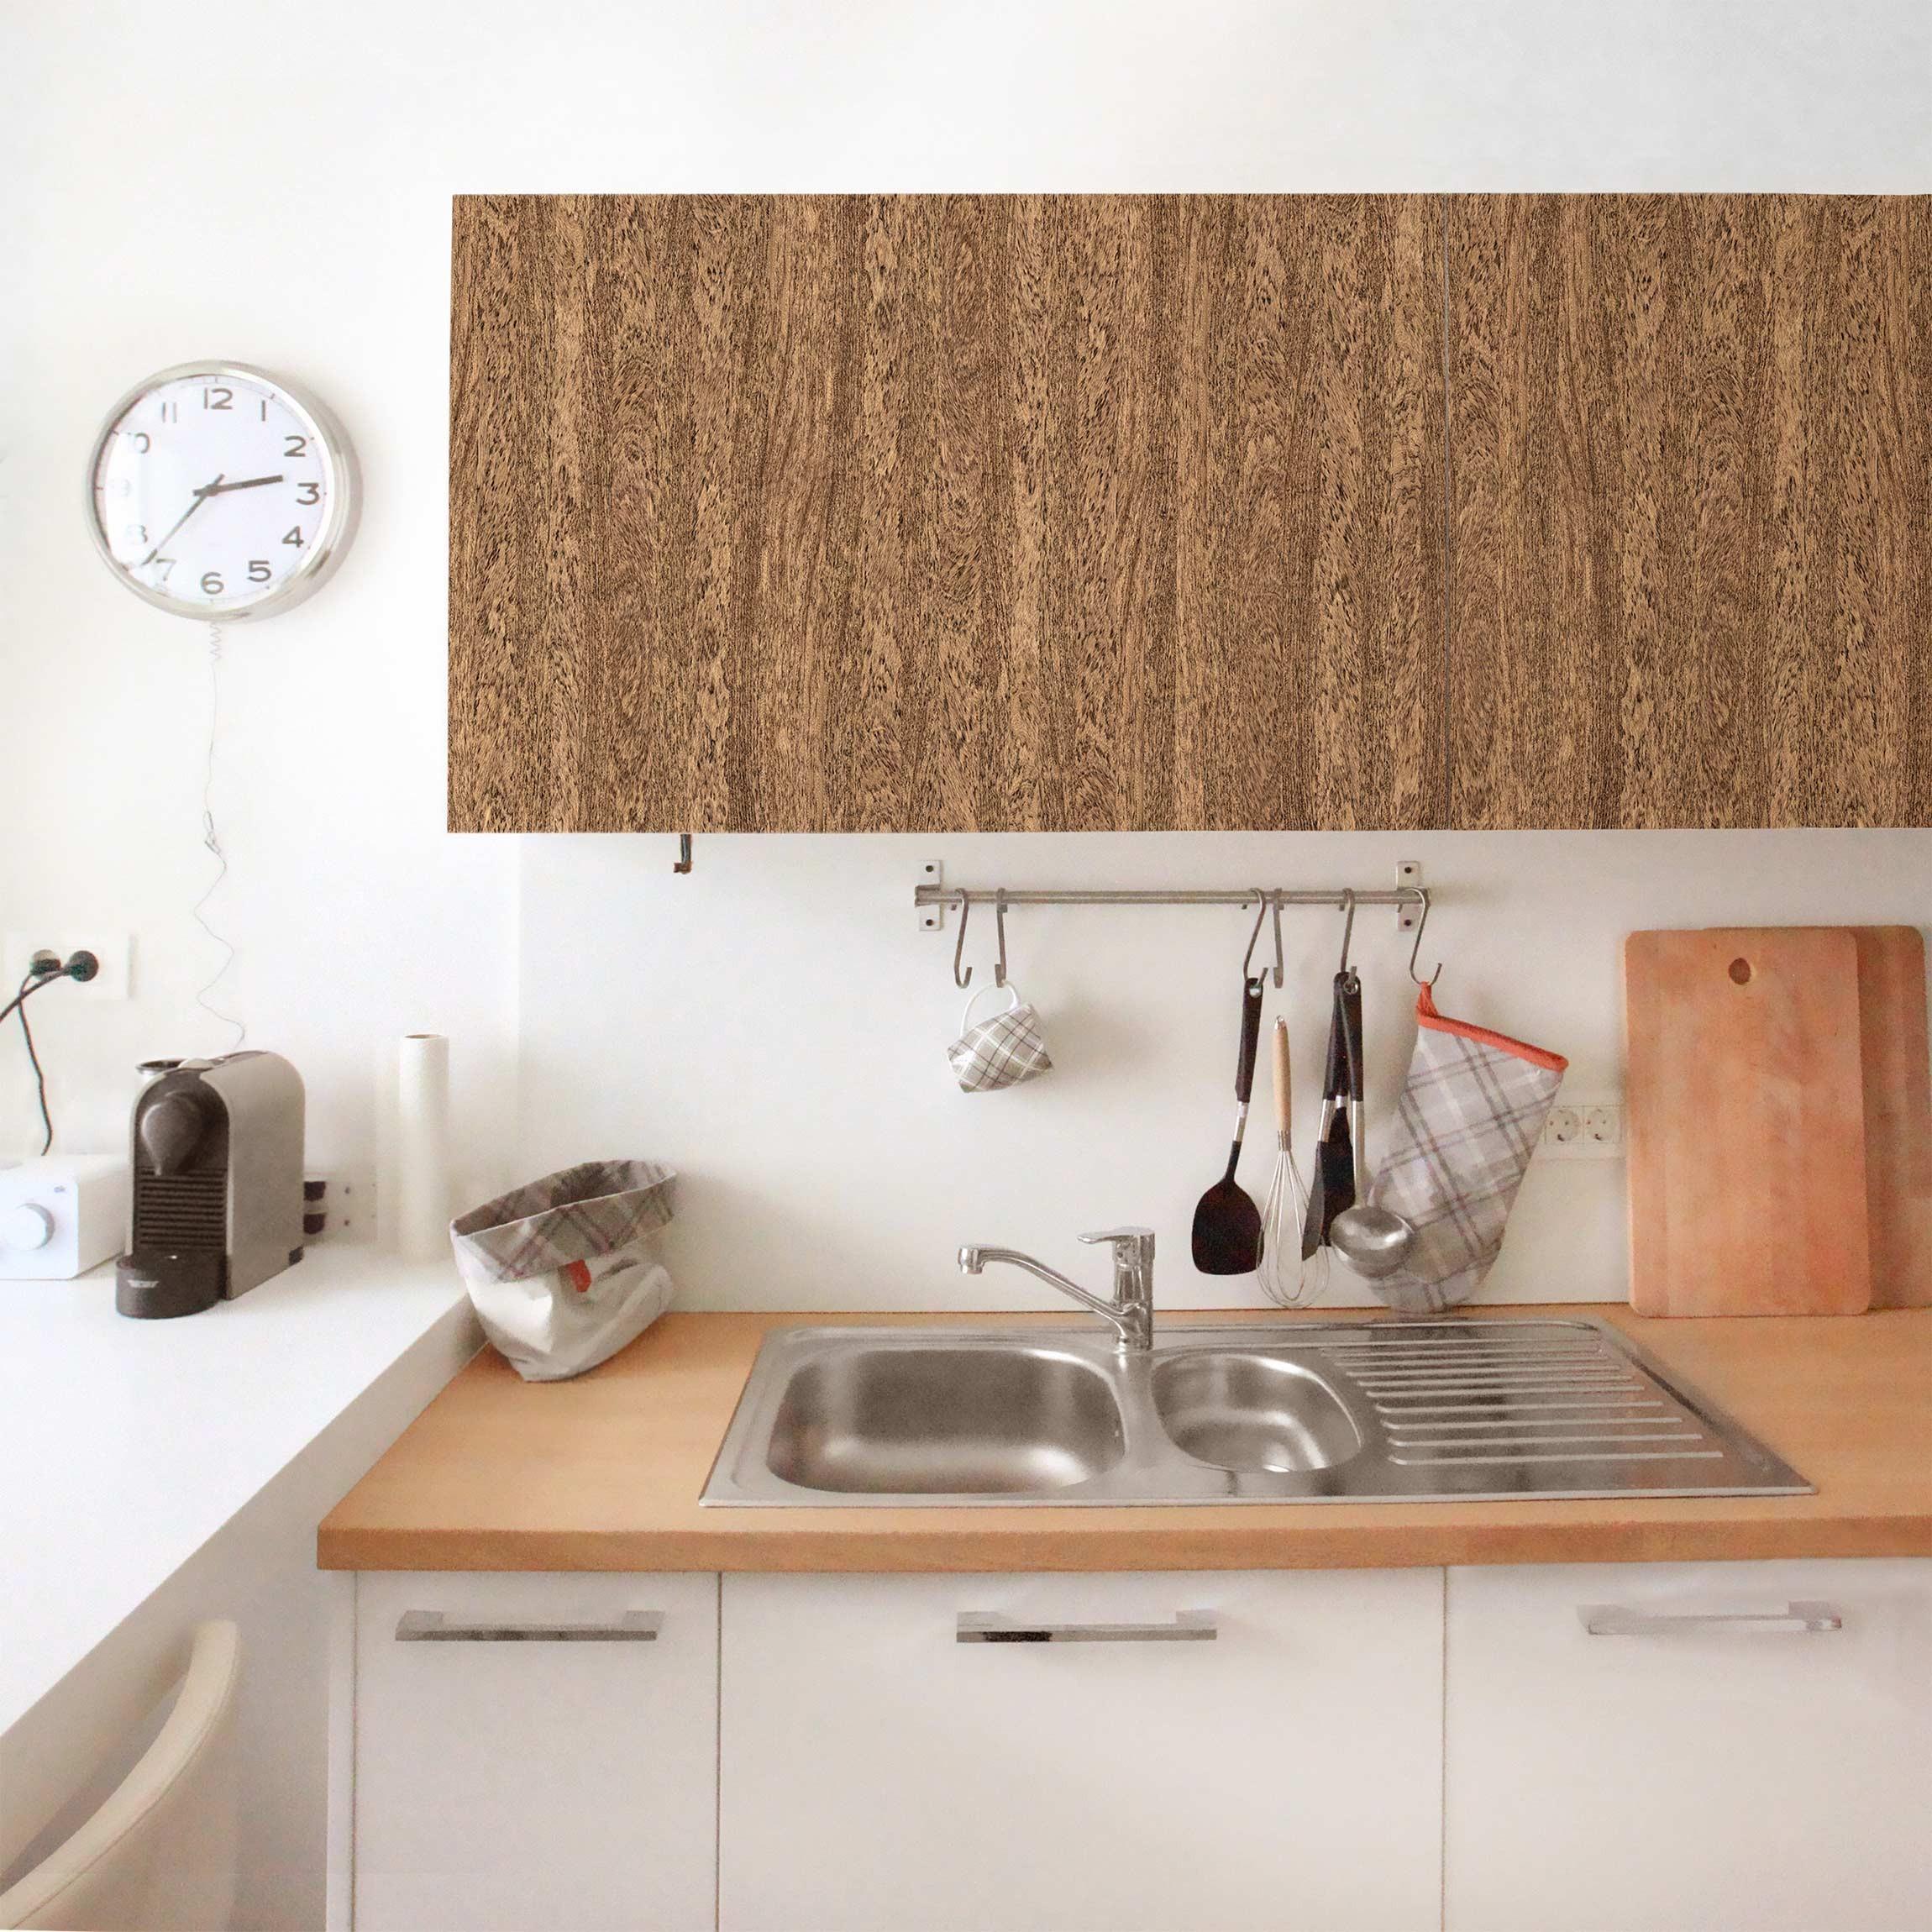 Carta adesiva per mobili amburana for Carta adesiva mobili